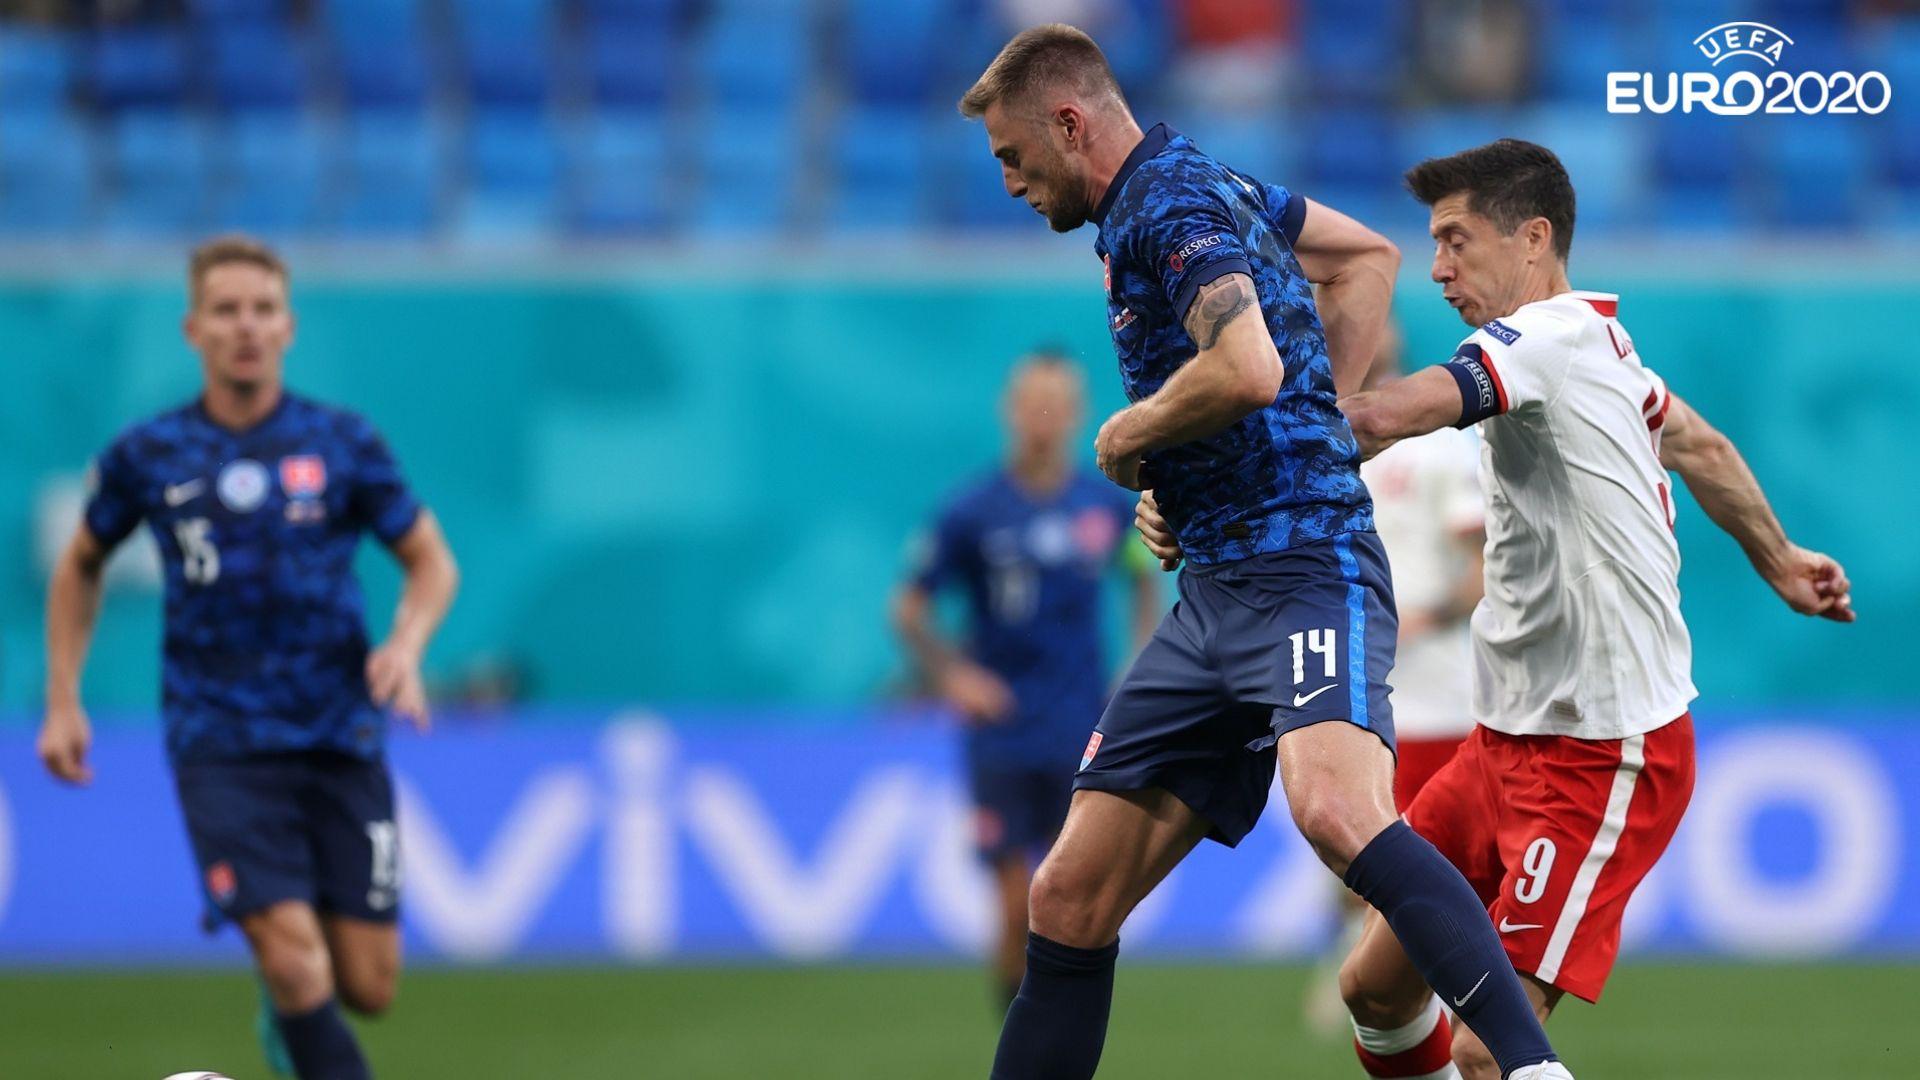 Аутсайдерът Словакия шамароса Полша за мечтан старт на Евро 2020